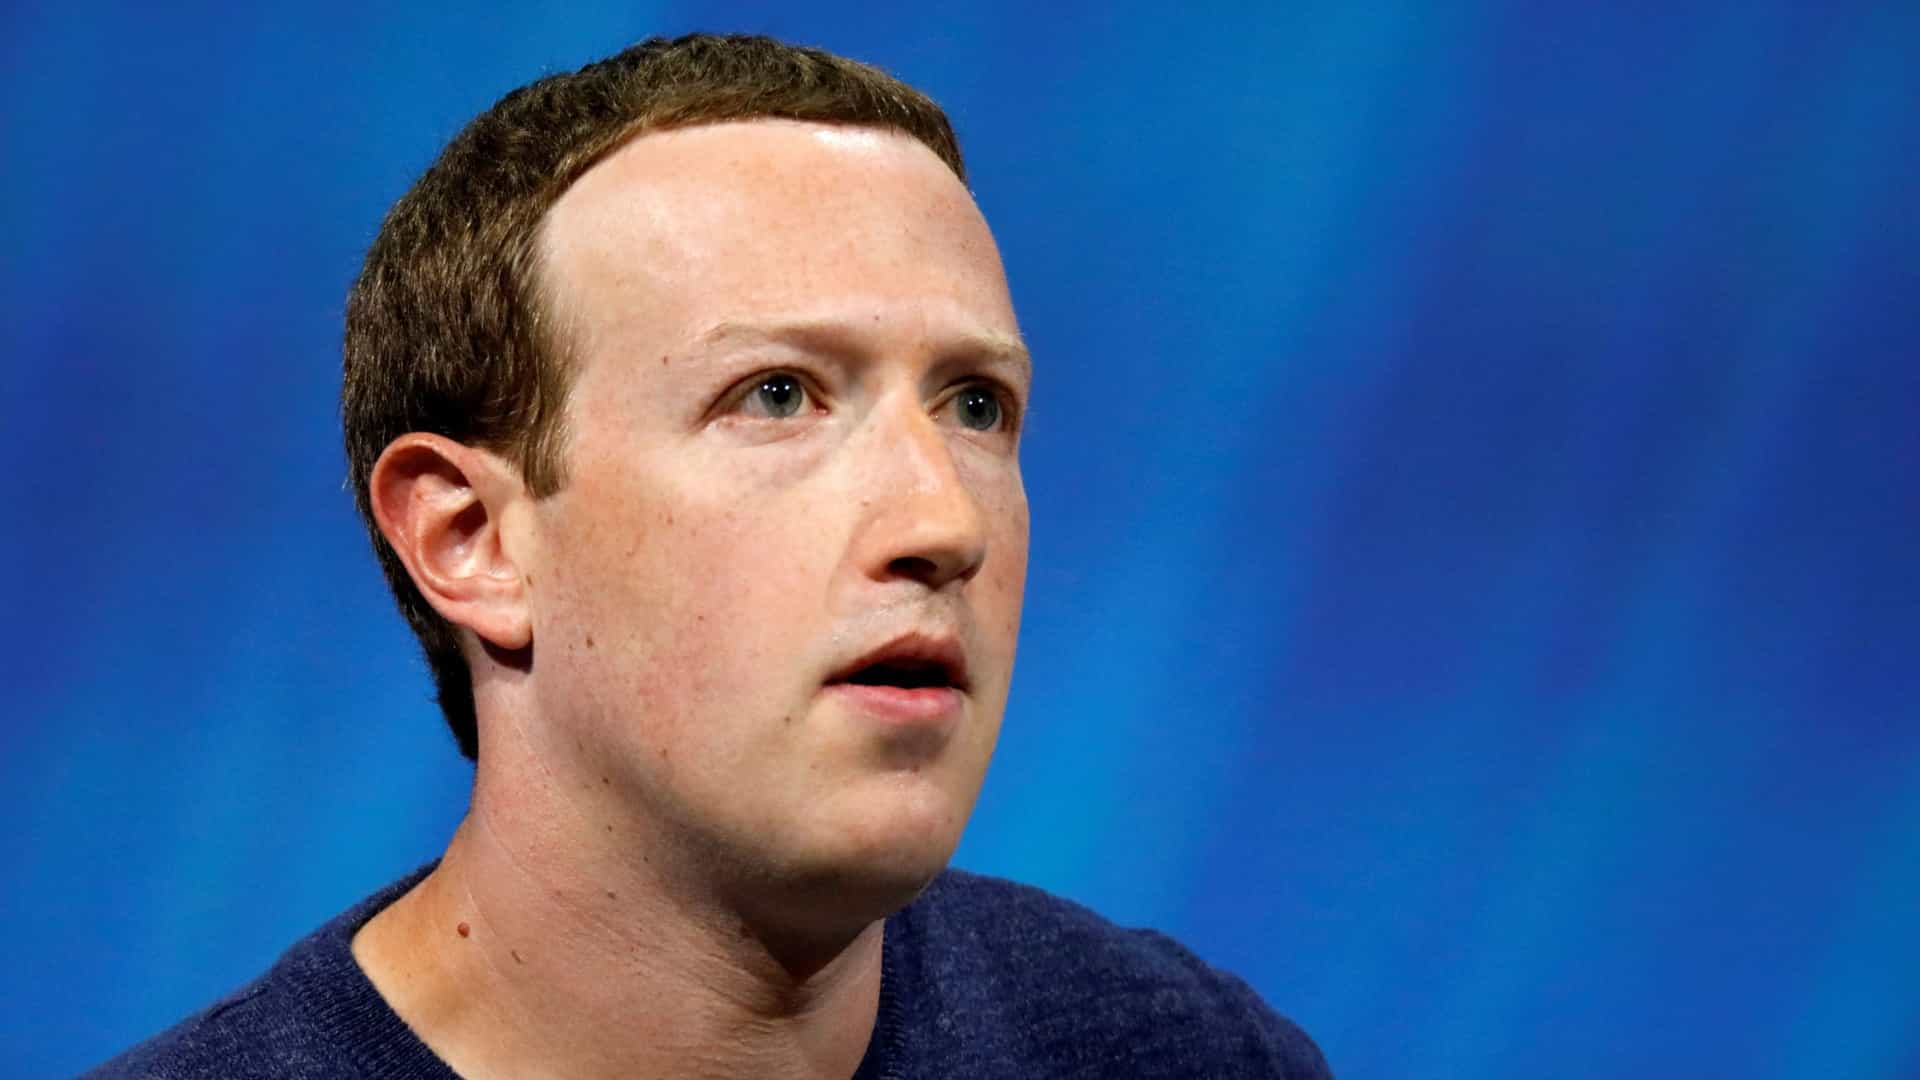 Hacker promete 'apagar' Zuckerberg do Facebook